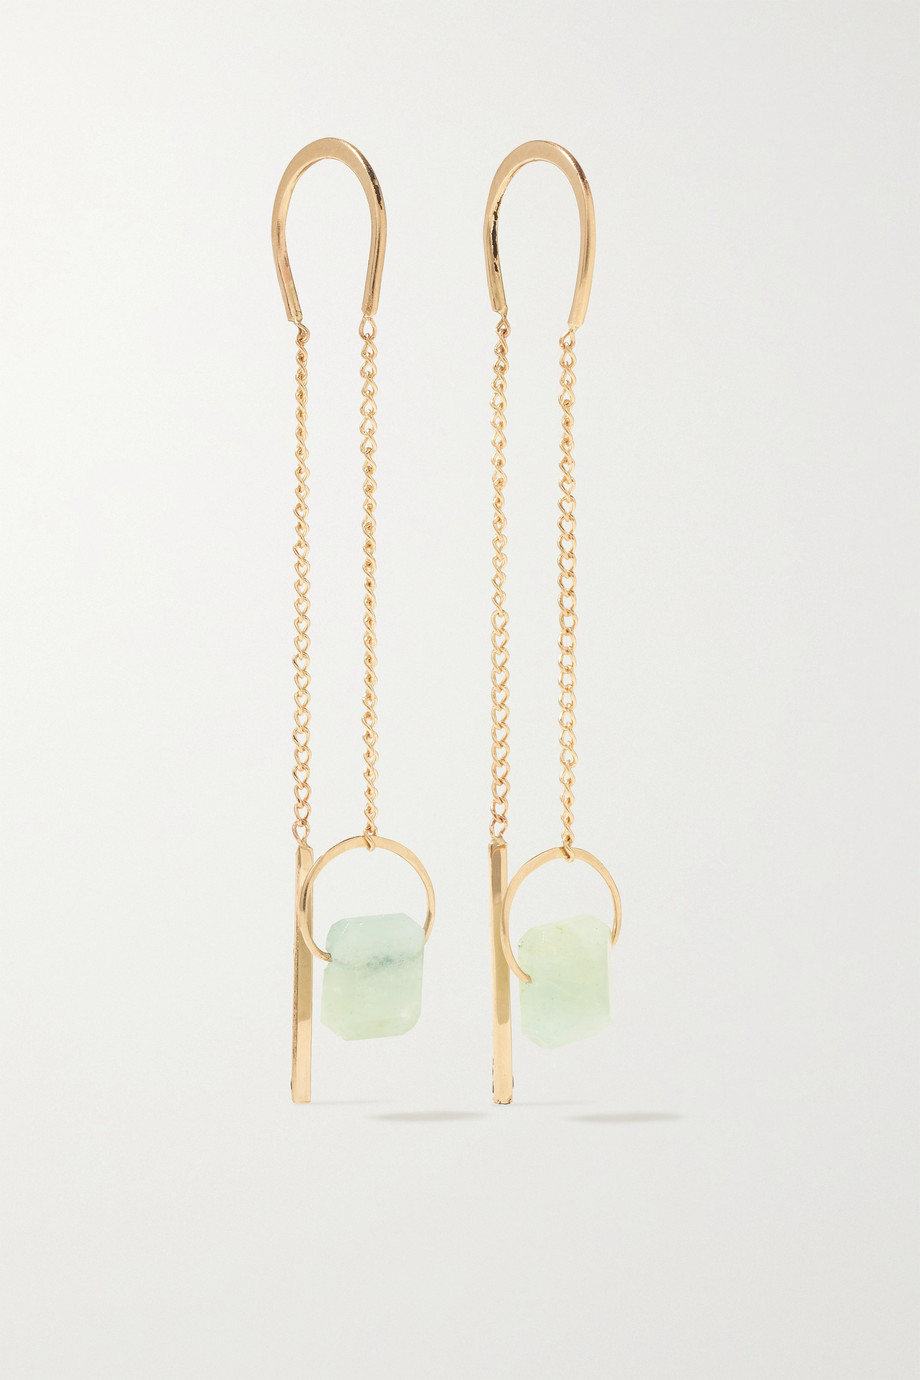 Melissa Joy Manning 14-karat recycled gold aquamarine earrings